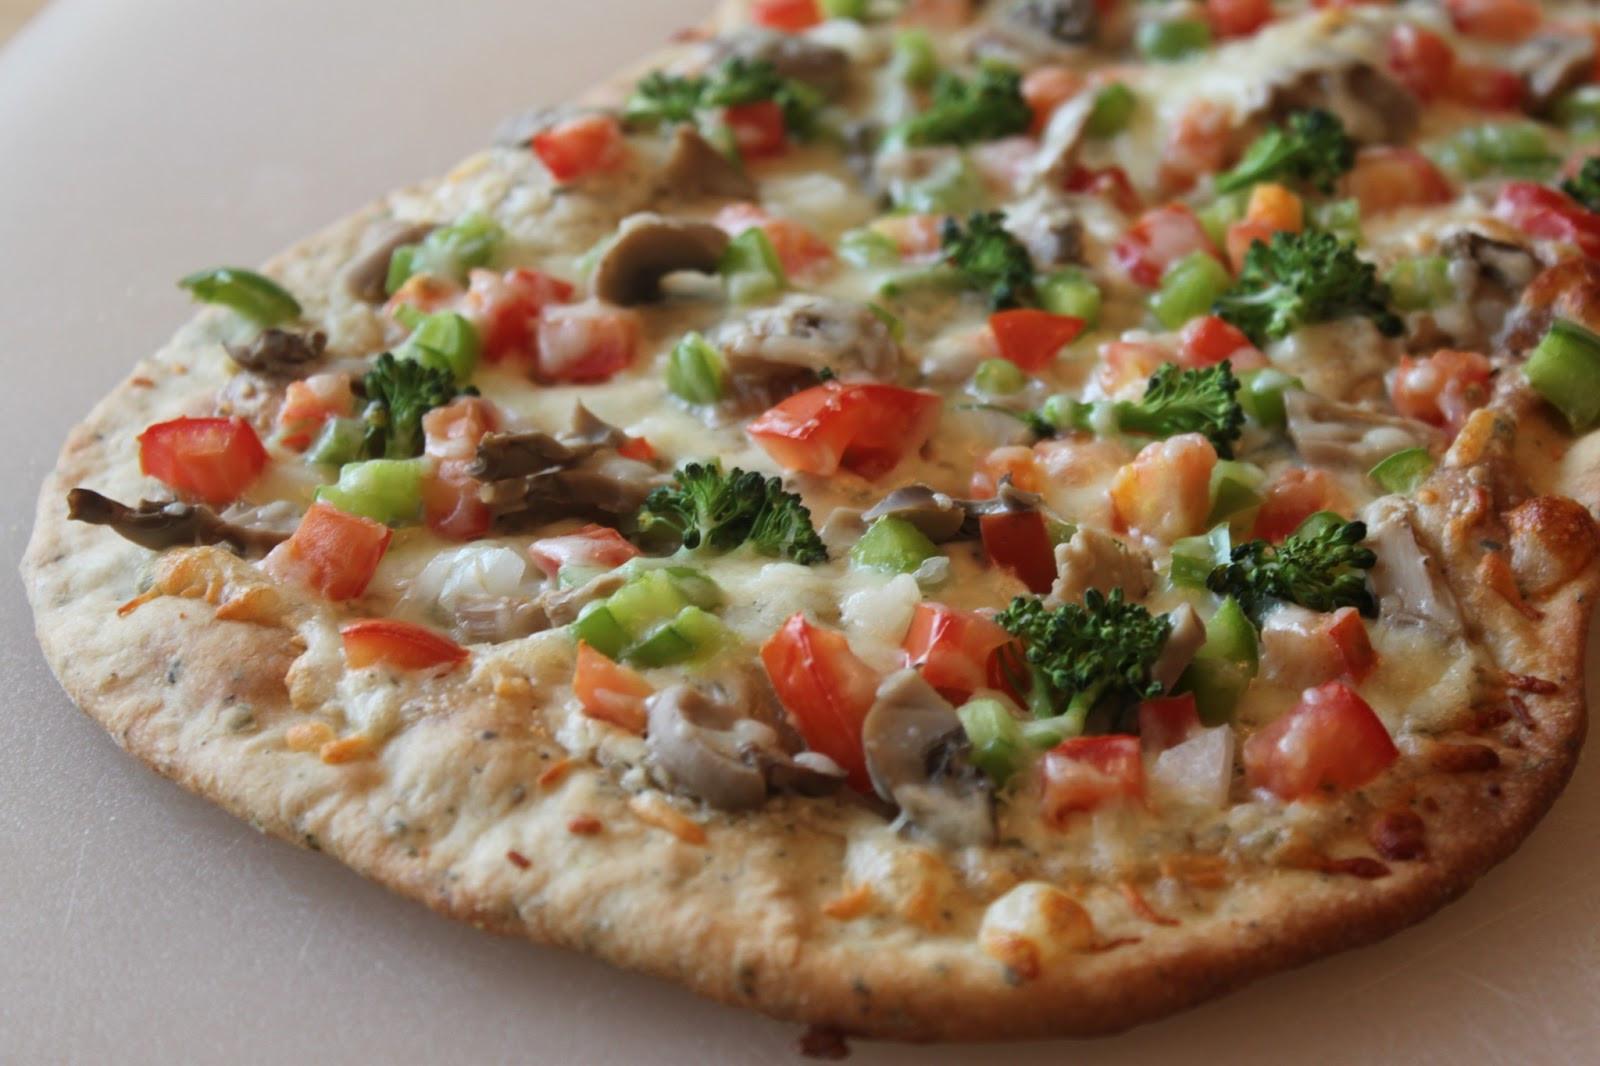 Vegetarian Flatbread Pizza Recipes  Recipes Plus More White Veggie Flatbread Pizza